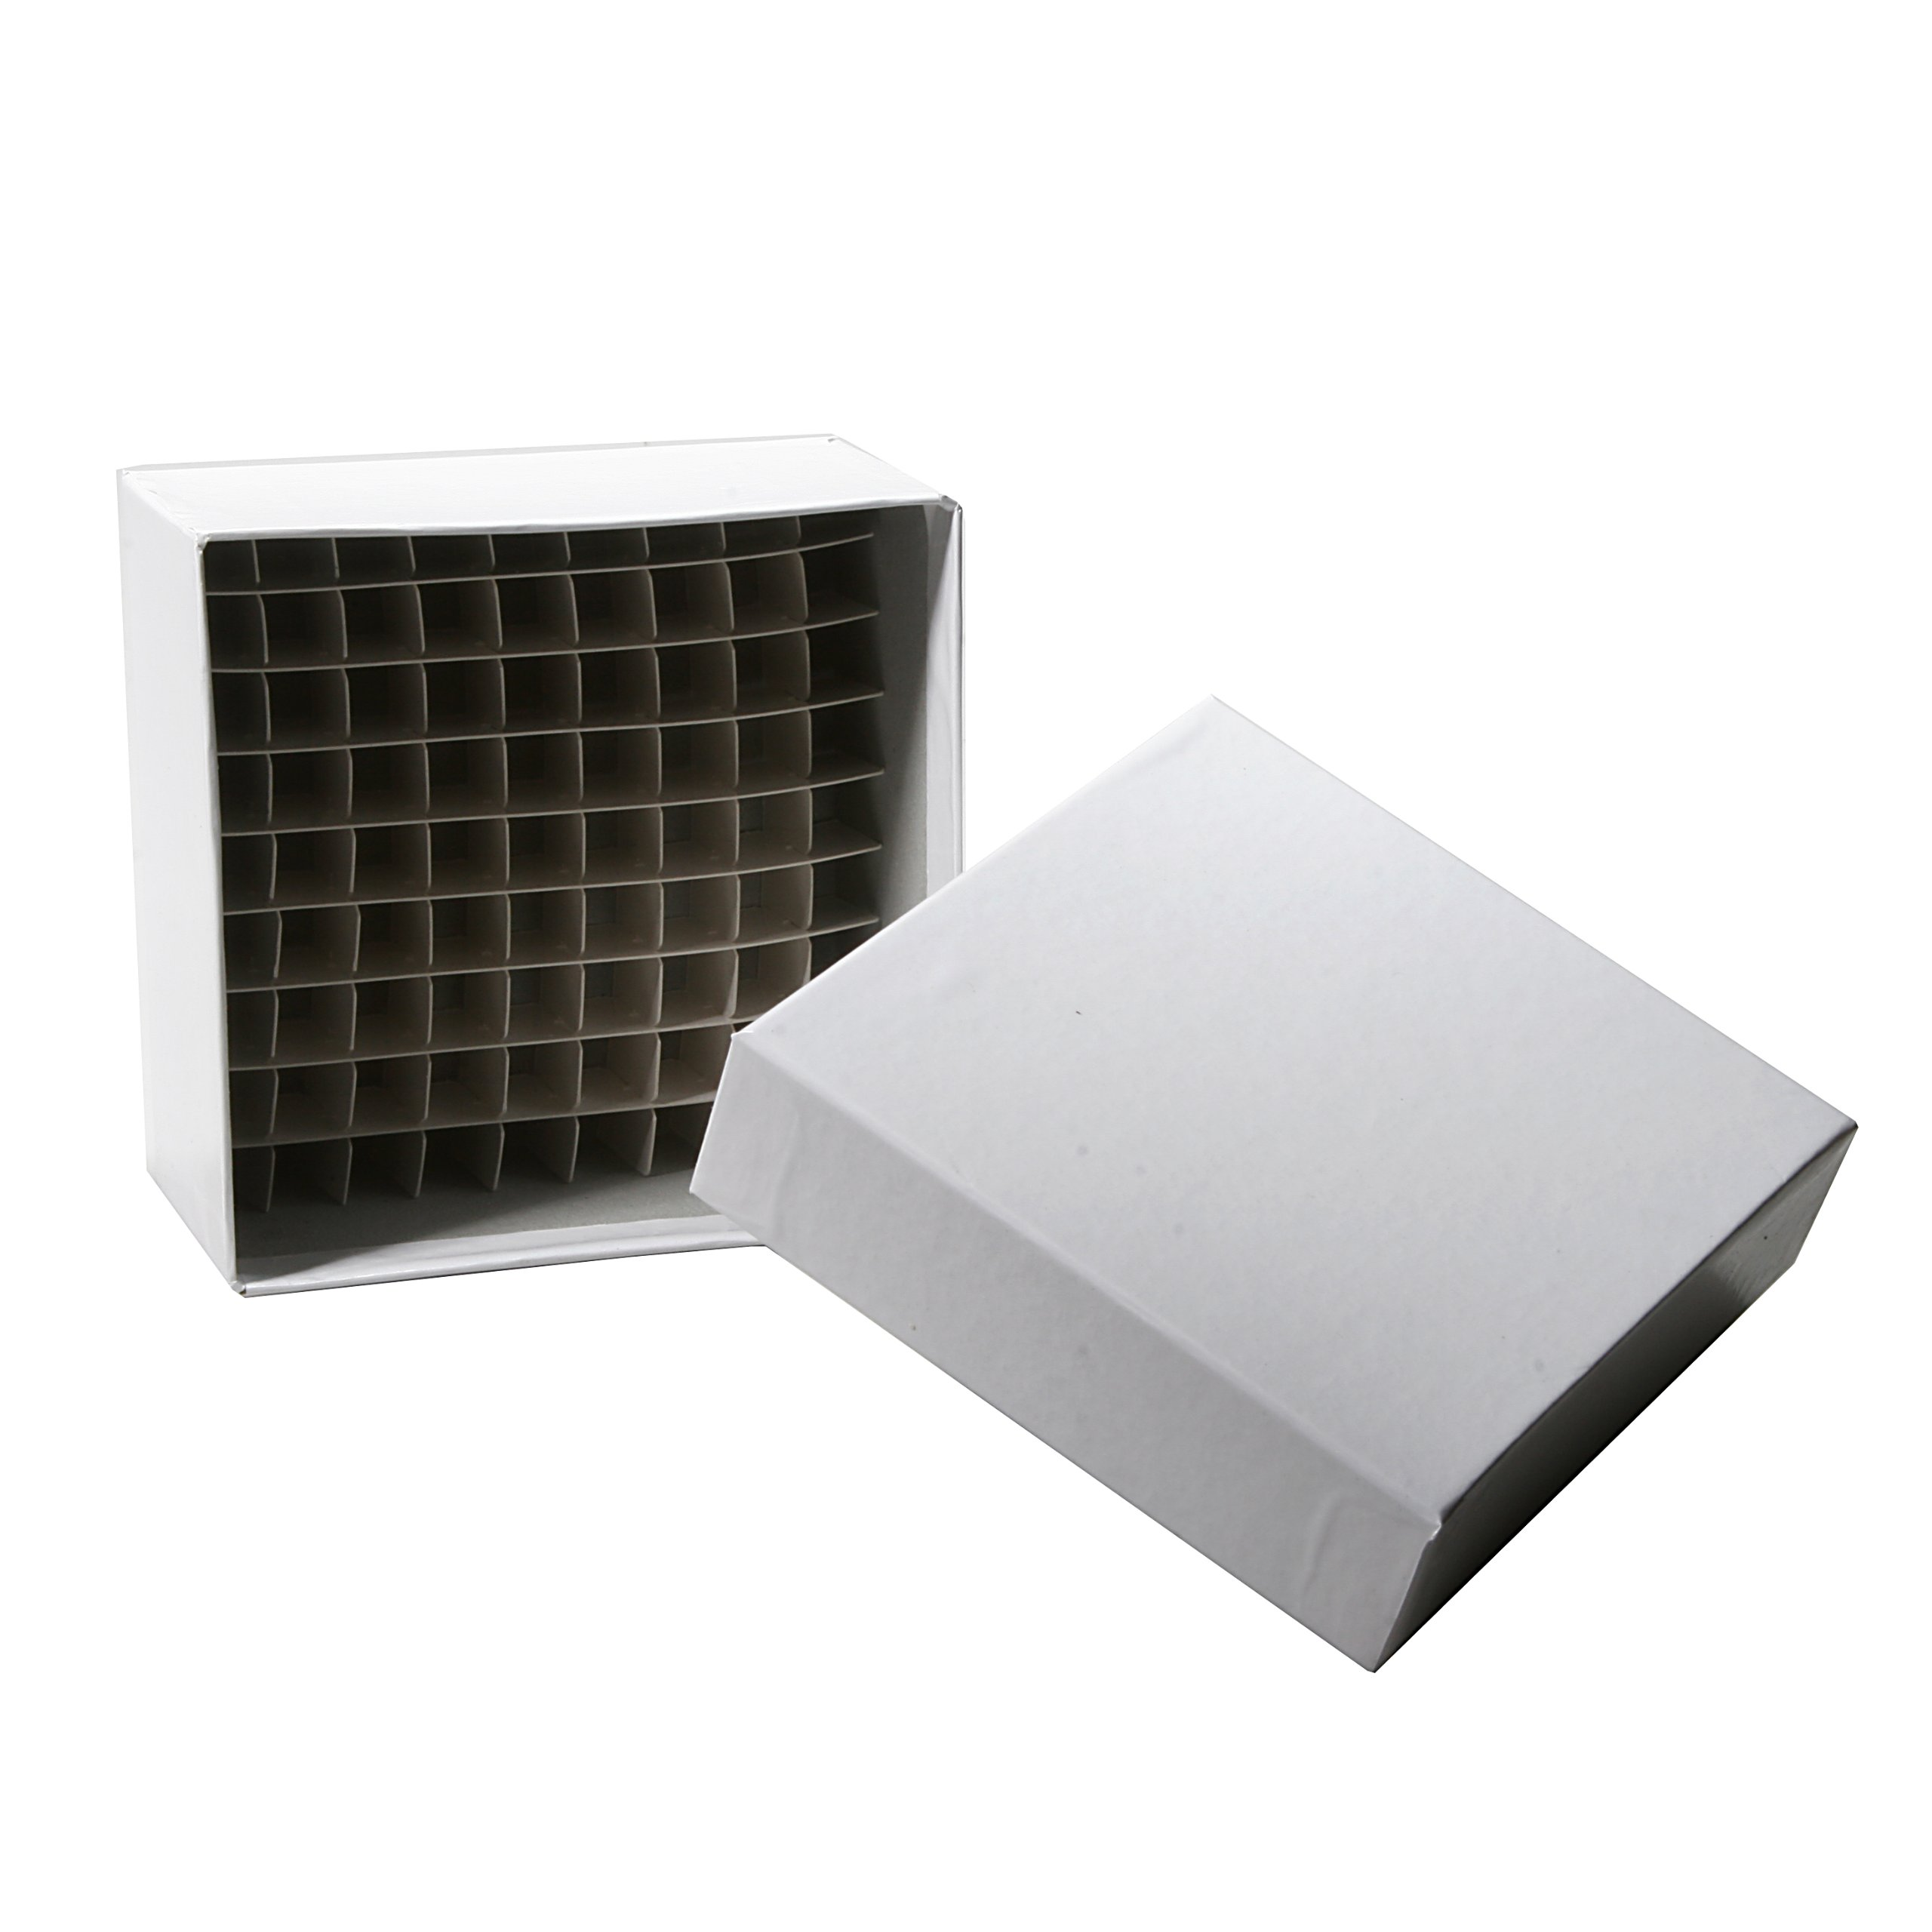 Biologix 90-2281 Cardboard Plasti-Coat Laminated Microcentrifuge Tube Freezer Storage Box, 2'' Height, 81 Places (Case of 100) by BioLogix